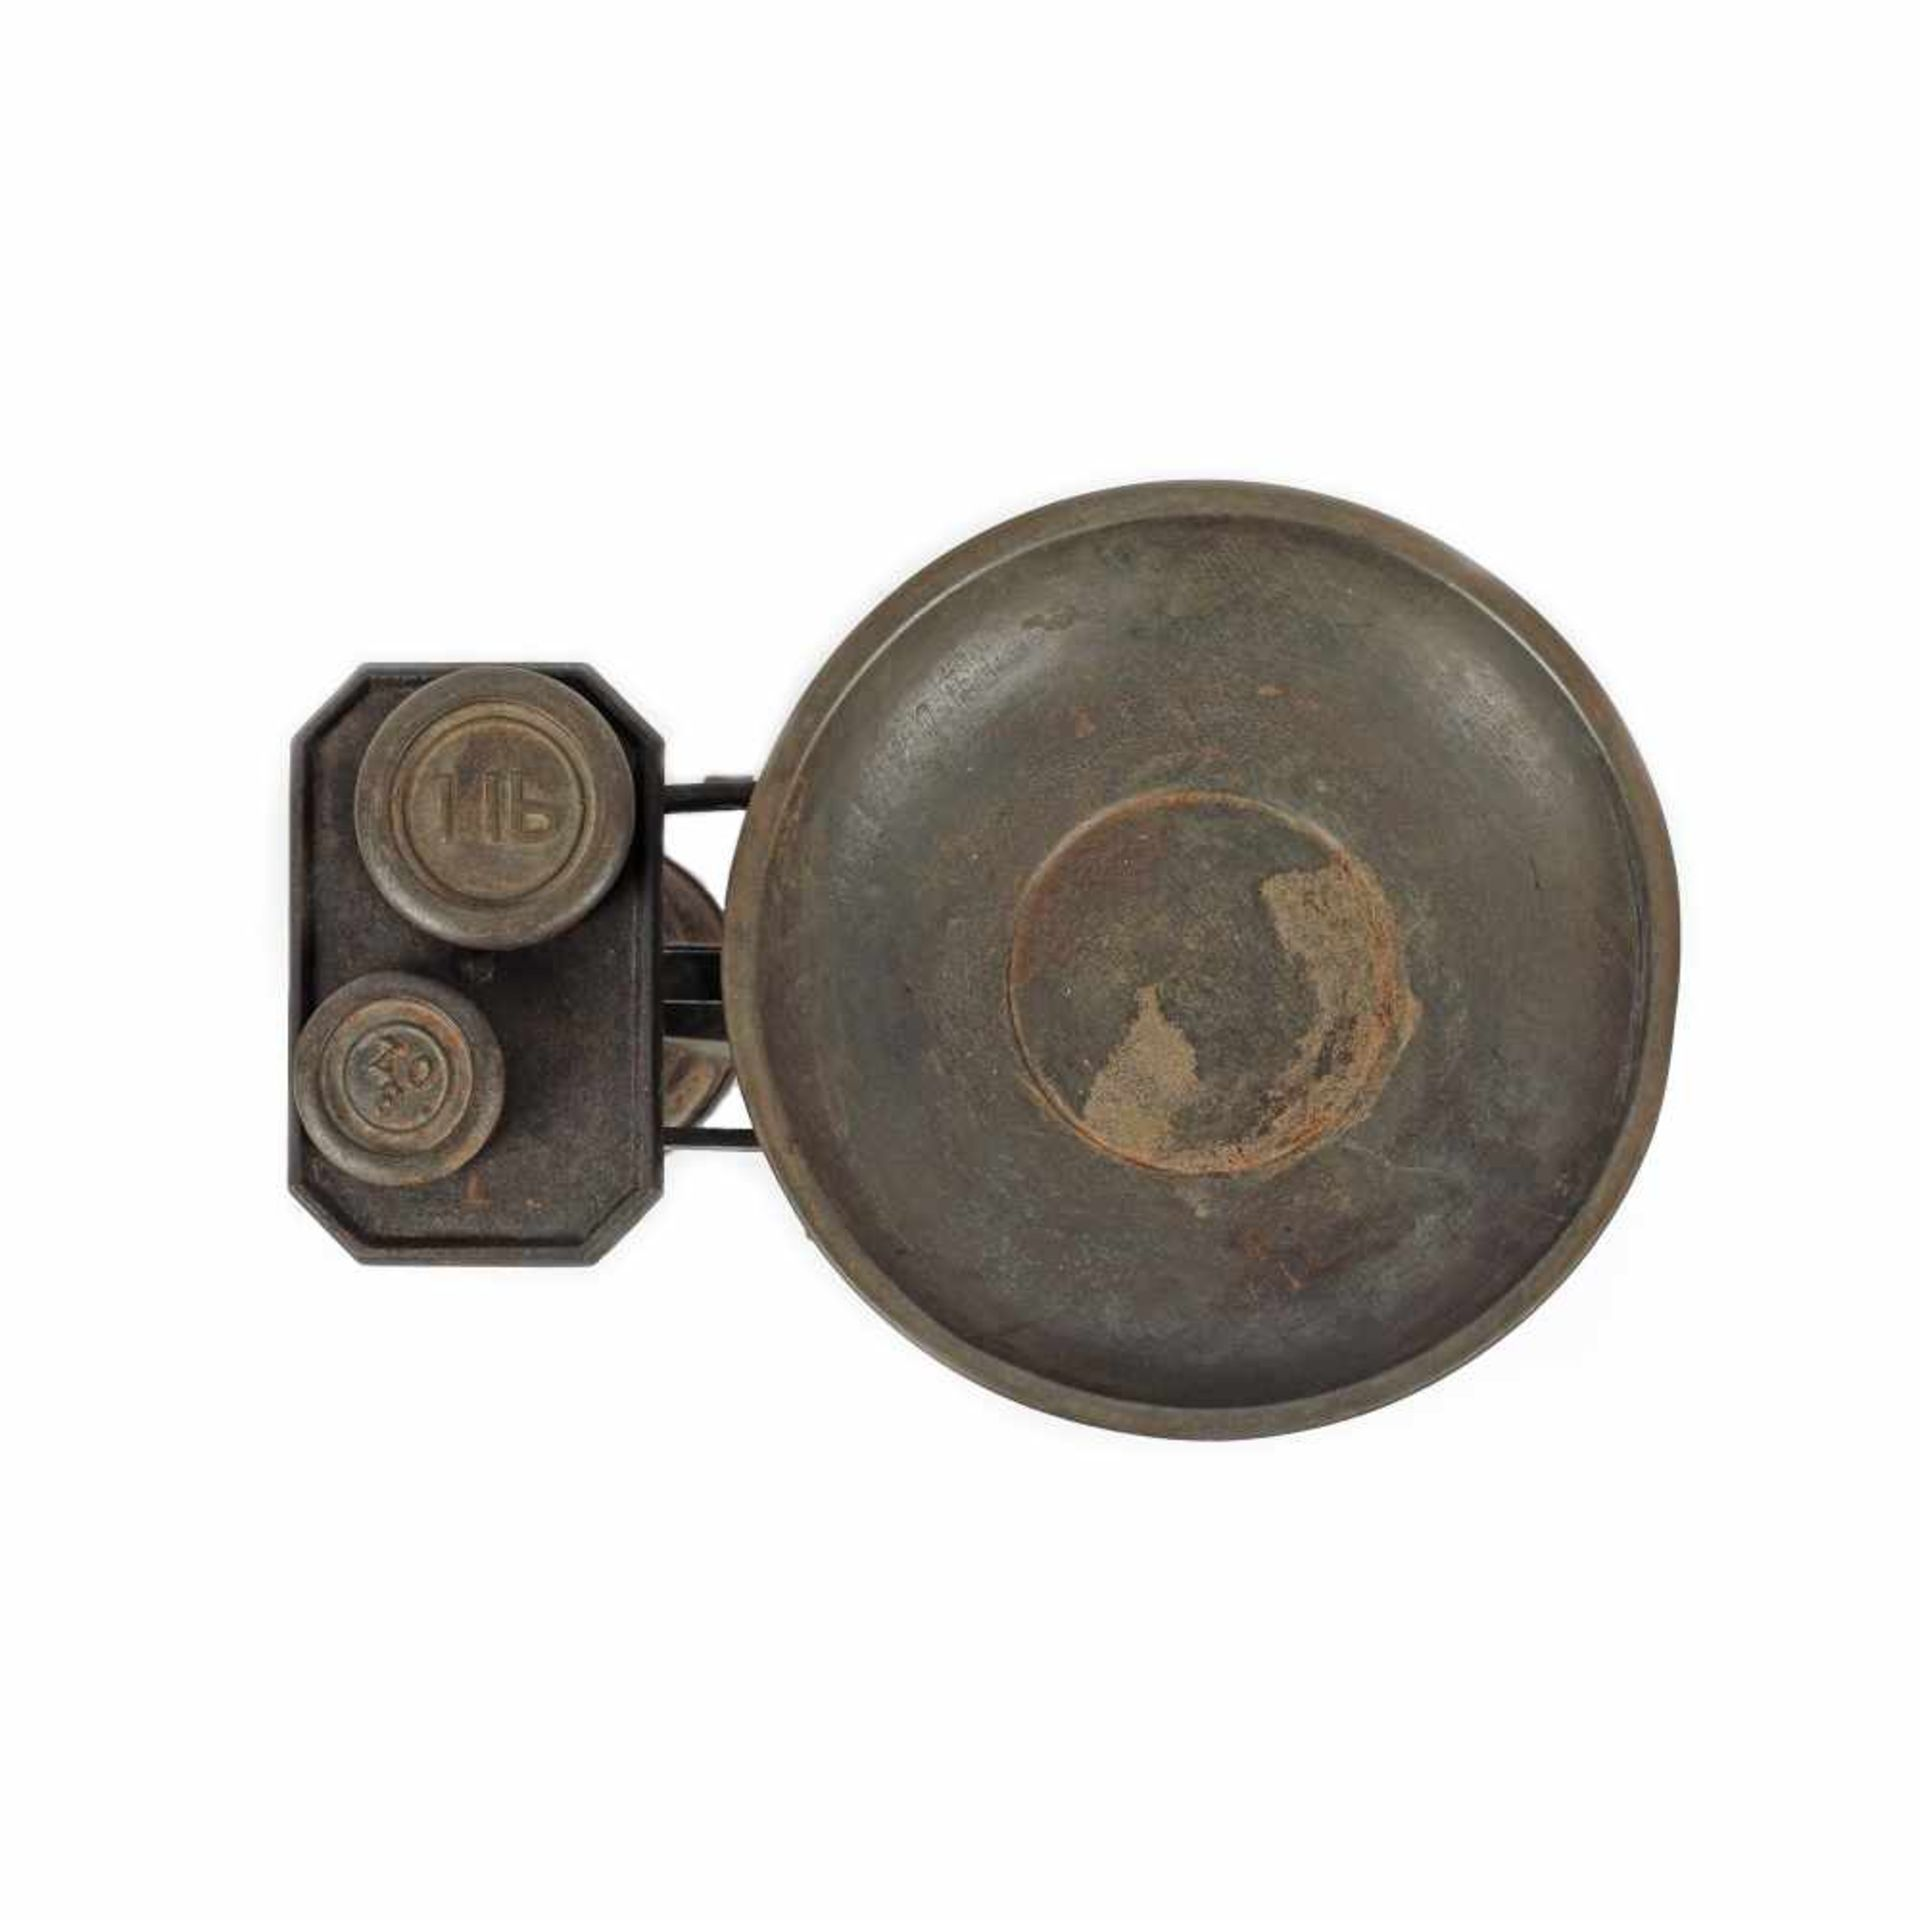 Bronze scale, S. Banfield Brighton brand, Great Britain, early 20th century - Bild 2 aus 3